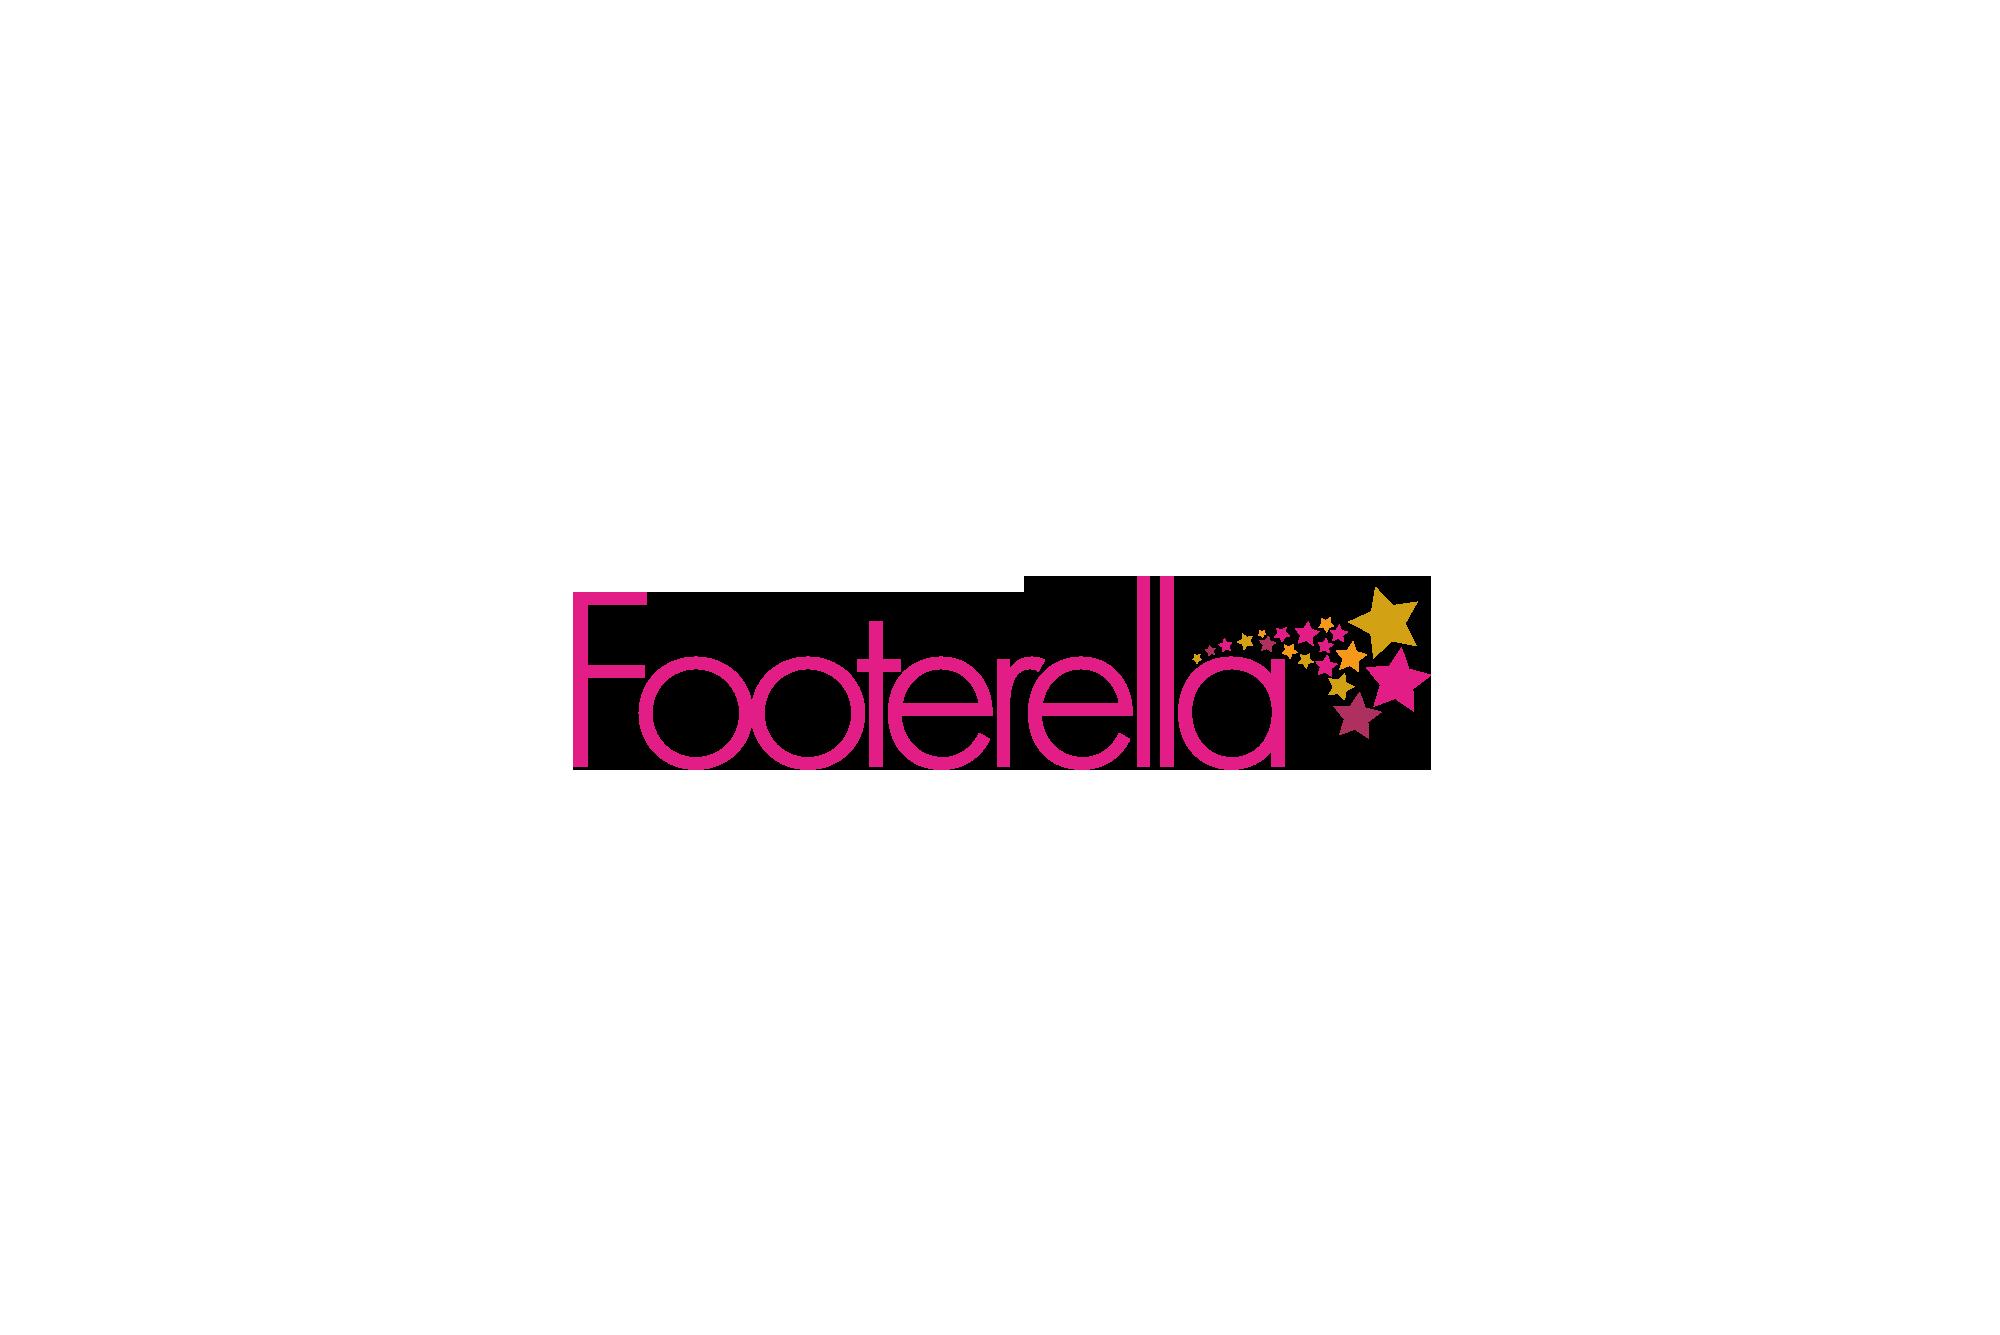 http://dubaipodiatry.com/wp-content/uploads/2015/12/DPC_logos_footerella.png